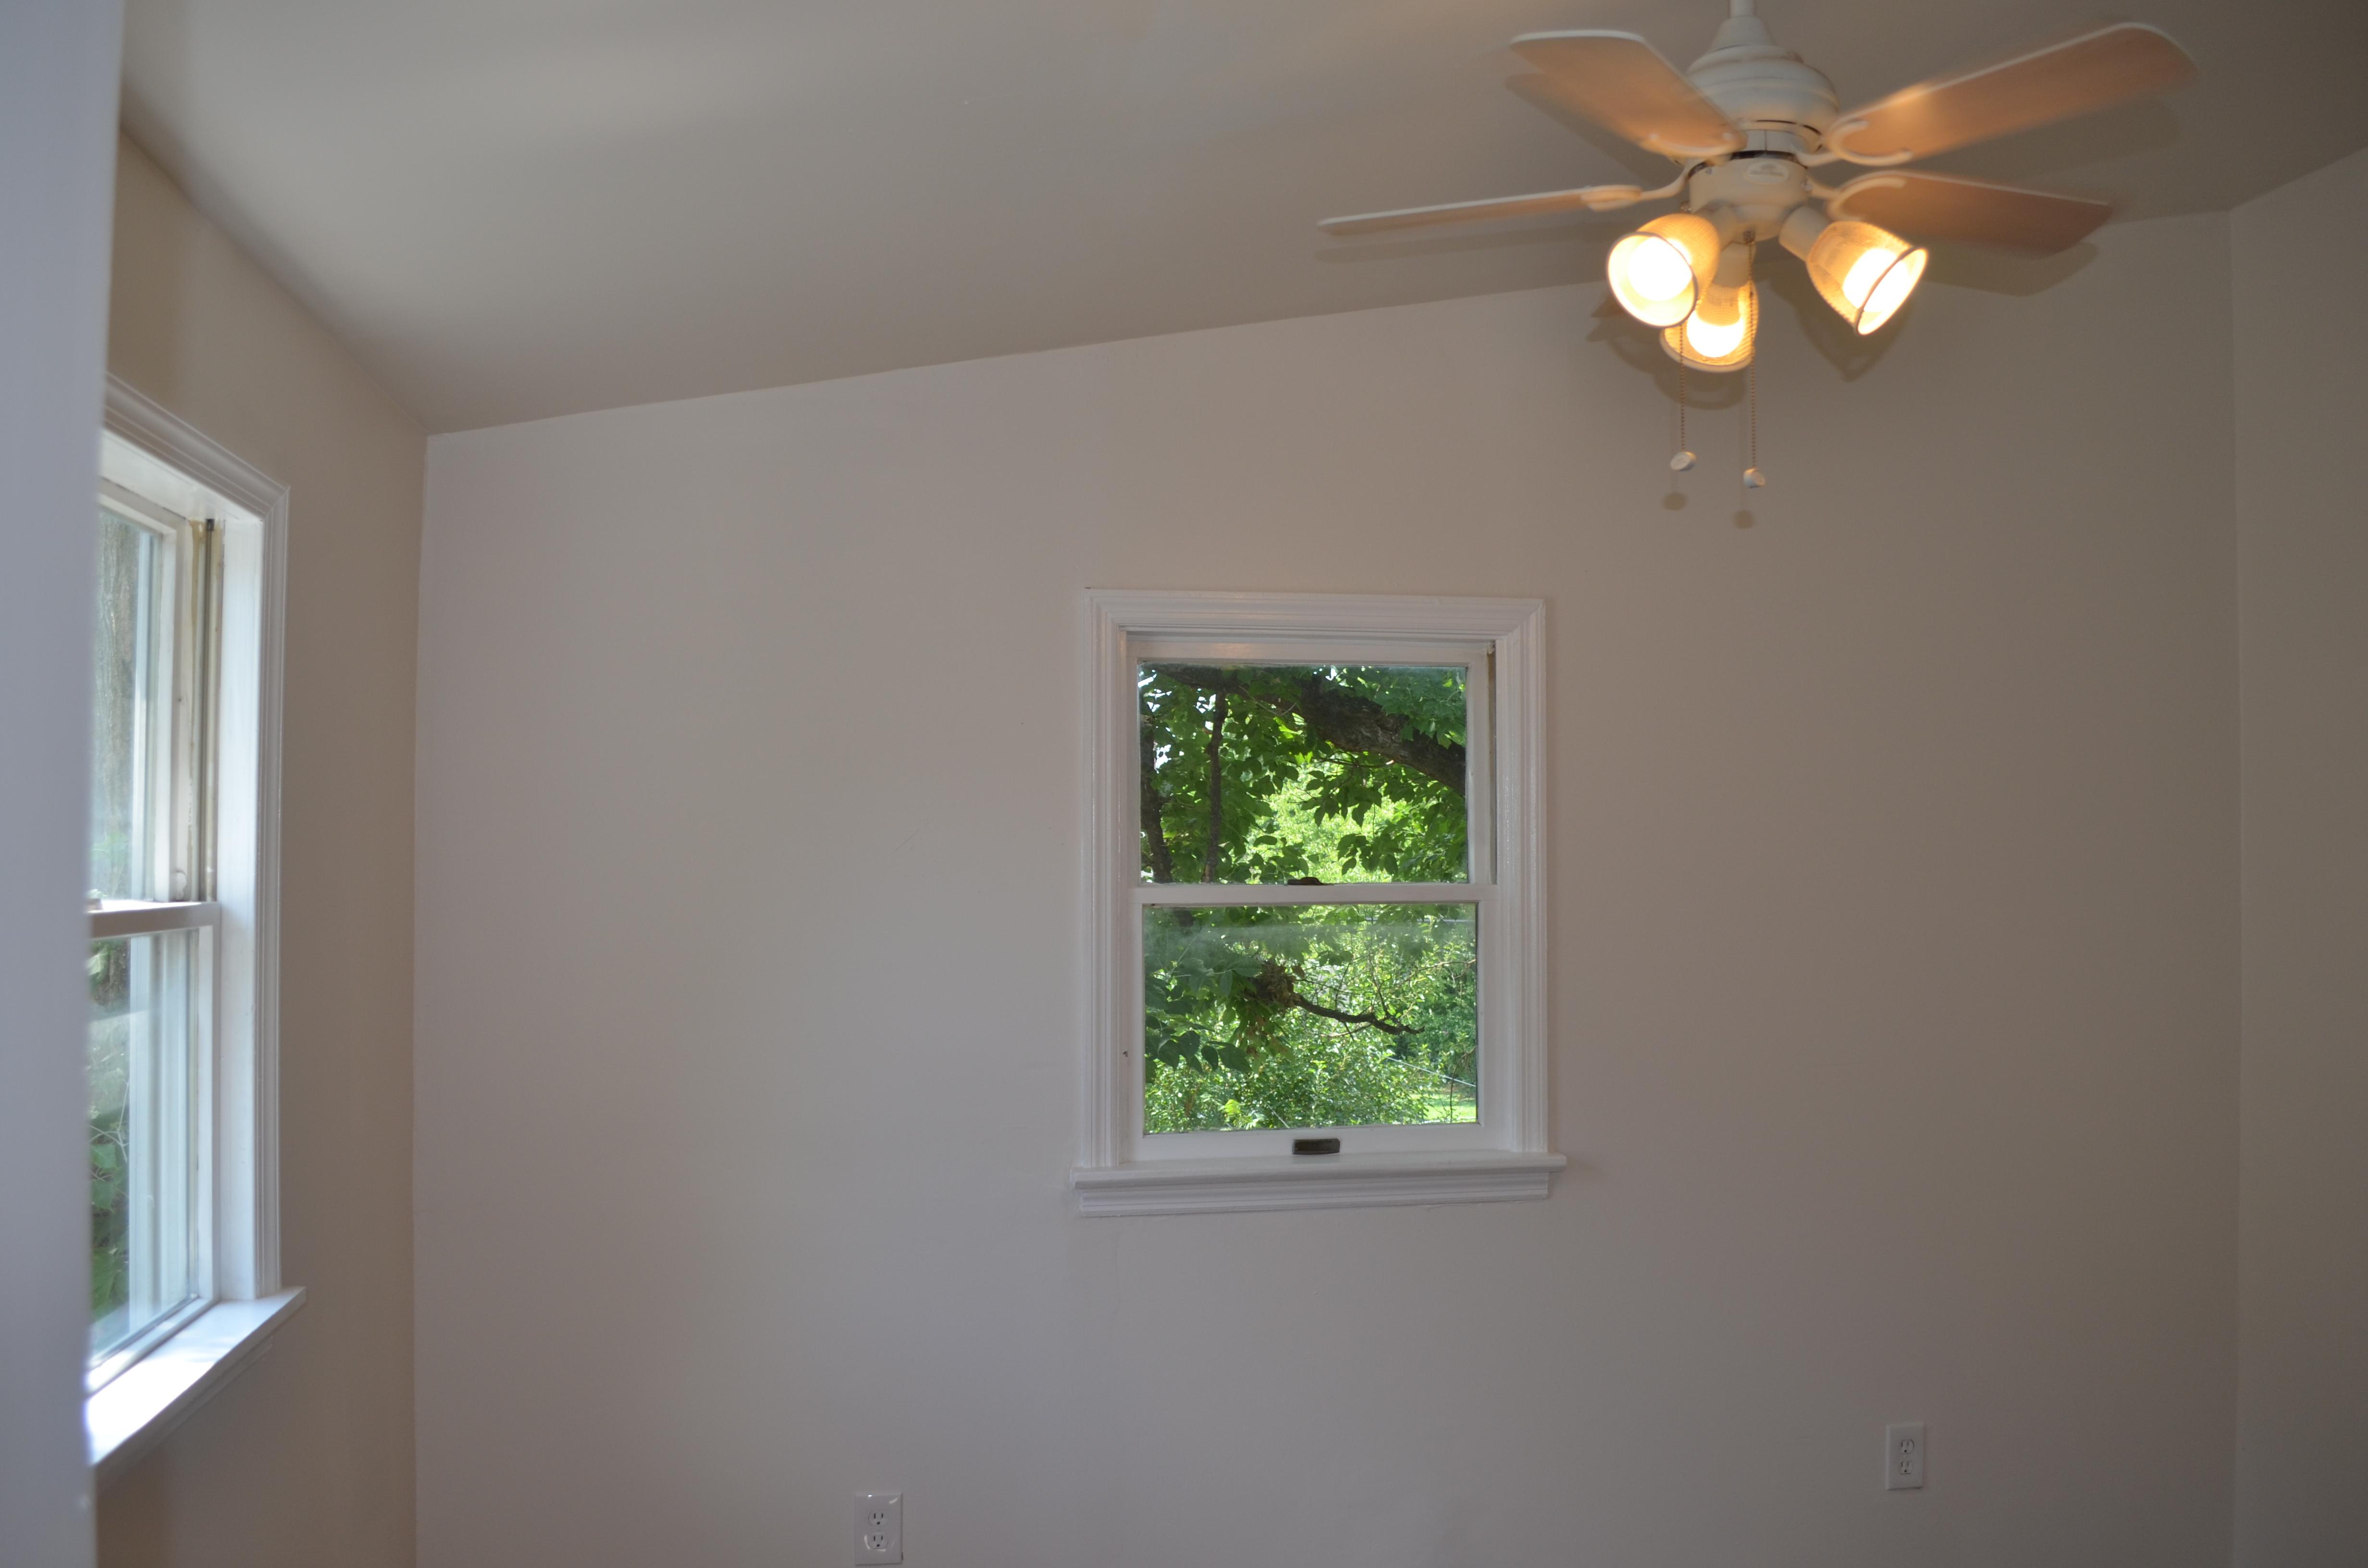 For Rent - 568 Walnut St P0ttstown PA 19464 - room 2